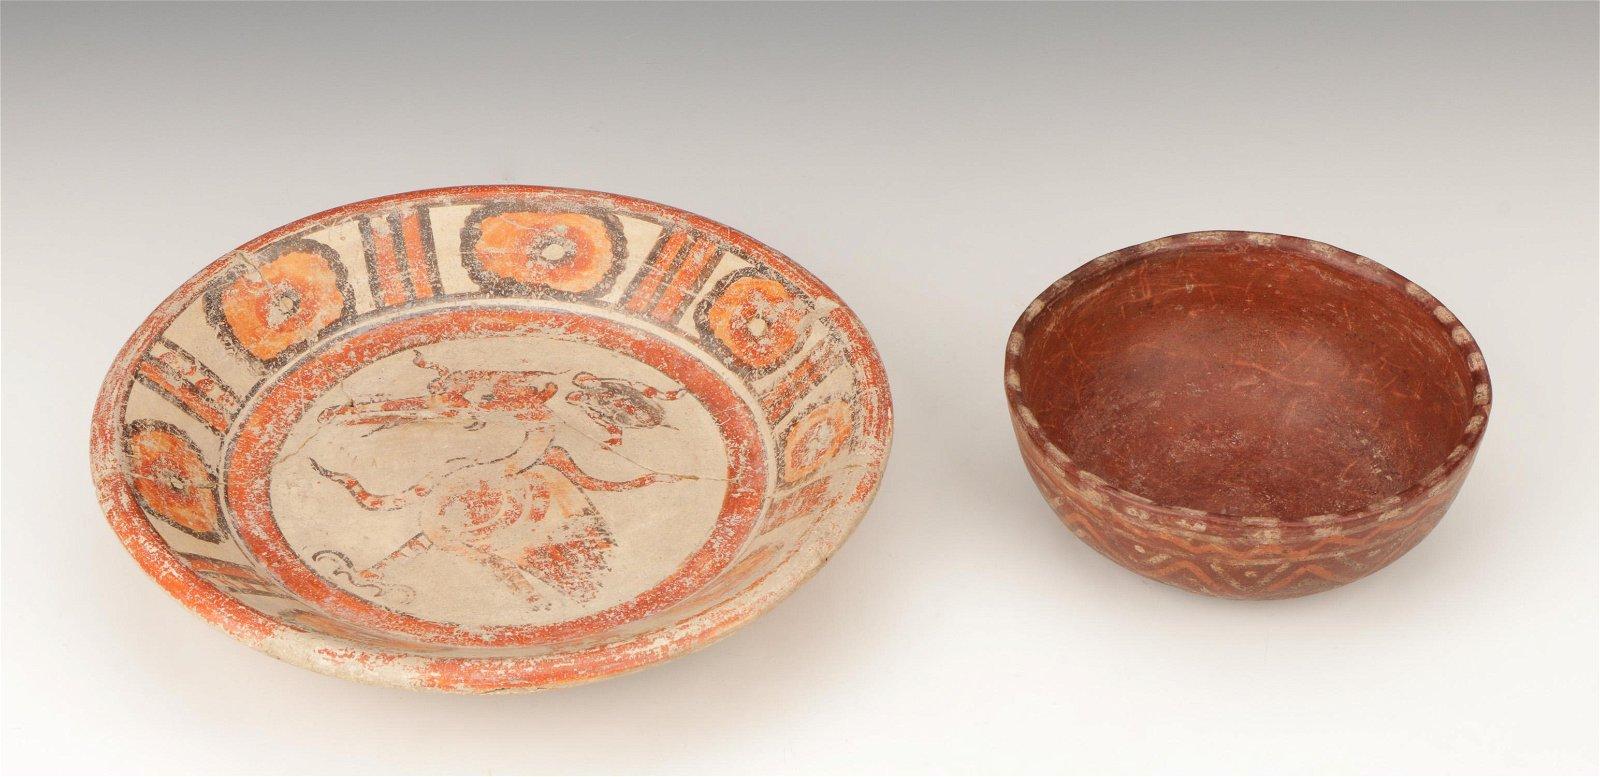 Two Pre-Columbian Mayan Pottery Bowls